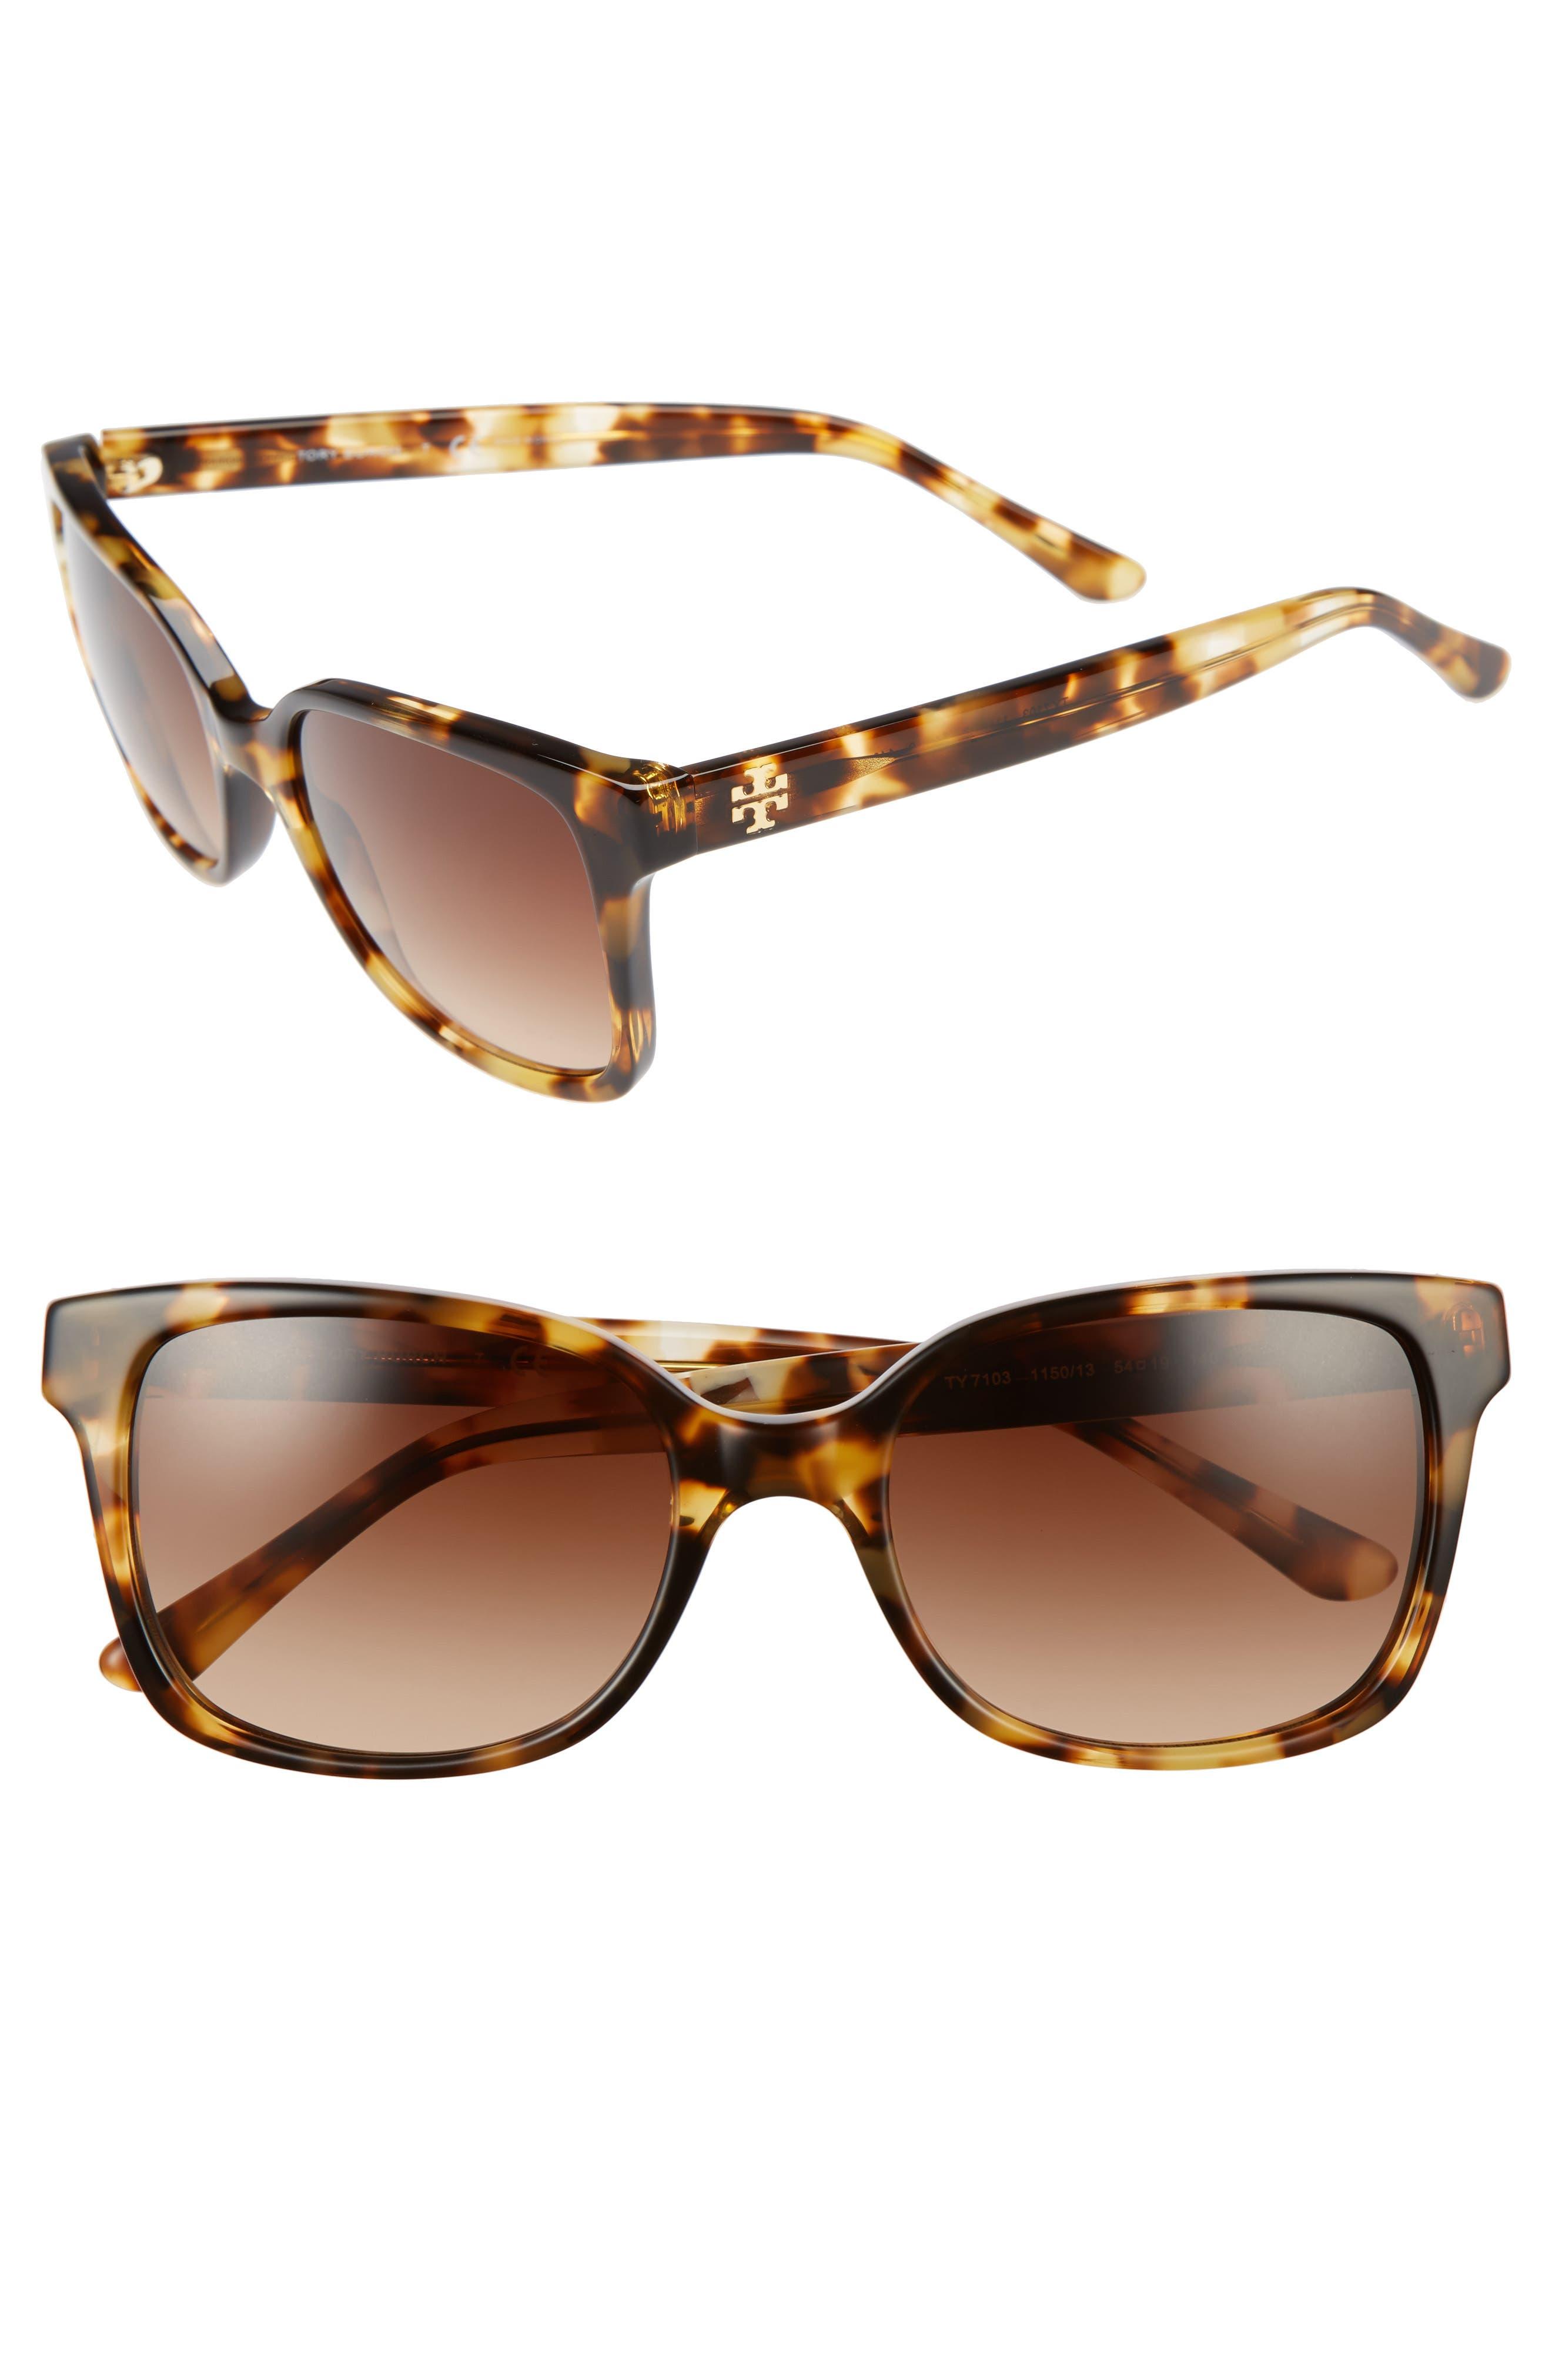 54mm Sunglasses,                             Main thumbnail 1, color,                             LIGHT TORTOISE